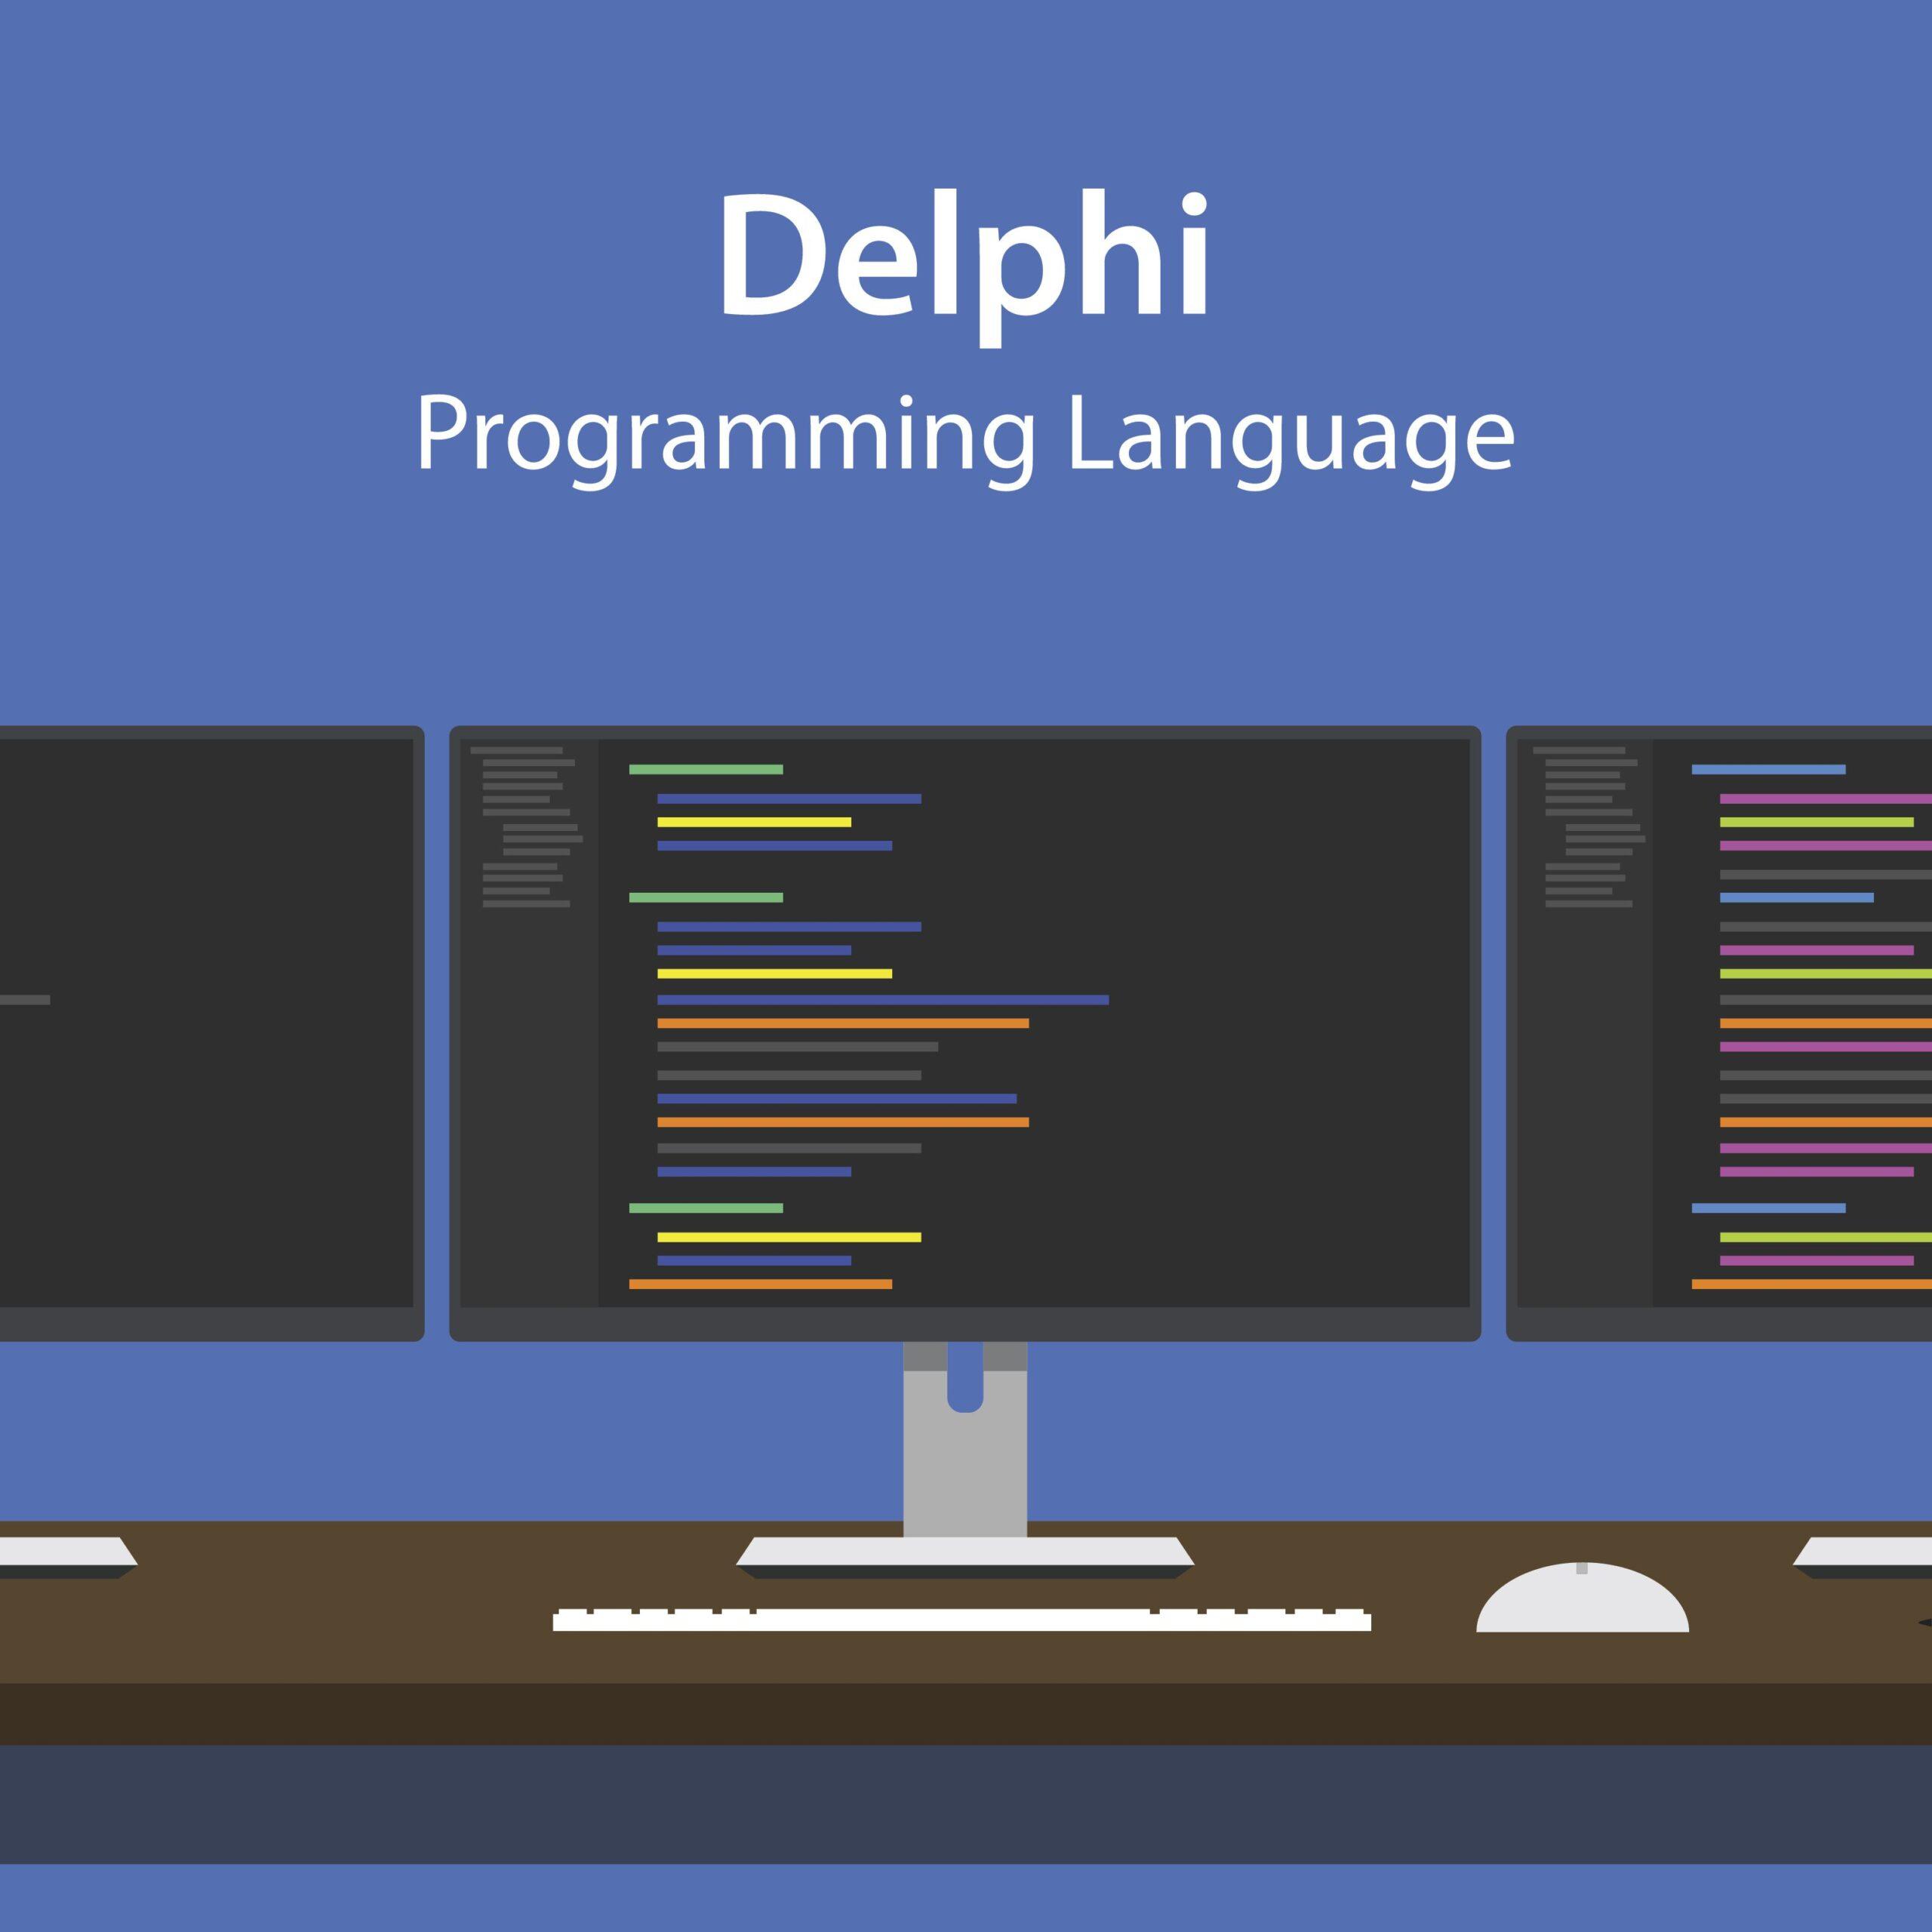 illustration-of-delphi-programming-language-code-displayed-on-three-monitor-637726150-5b01df13a474be003793d769[1]